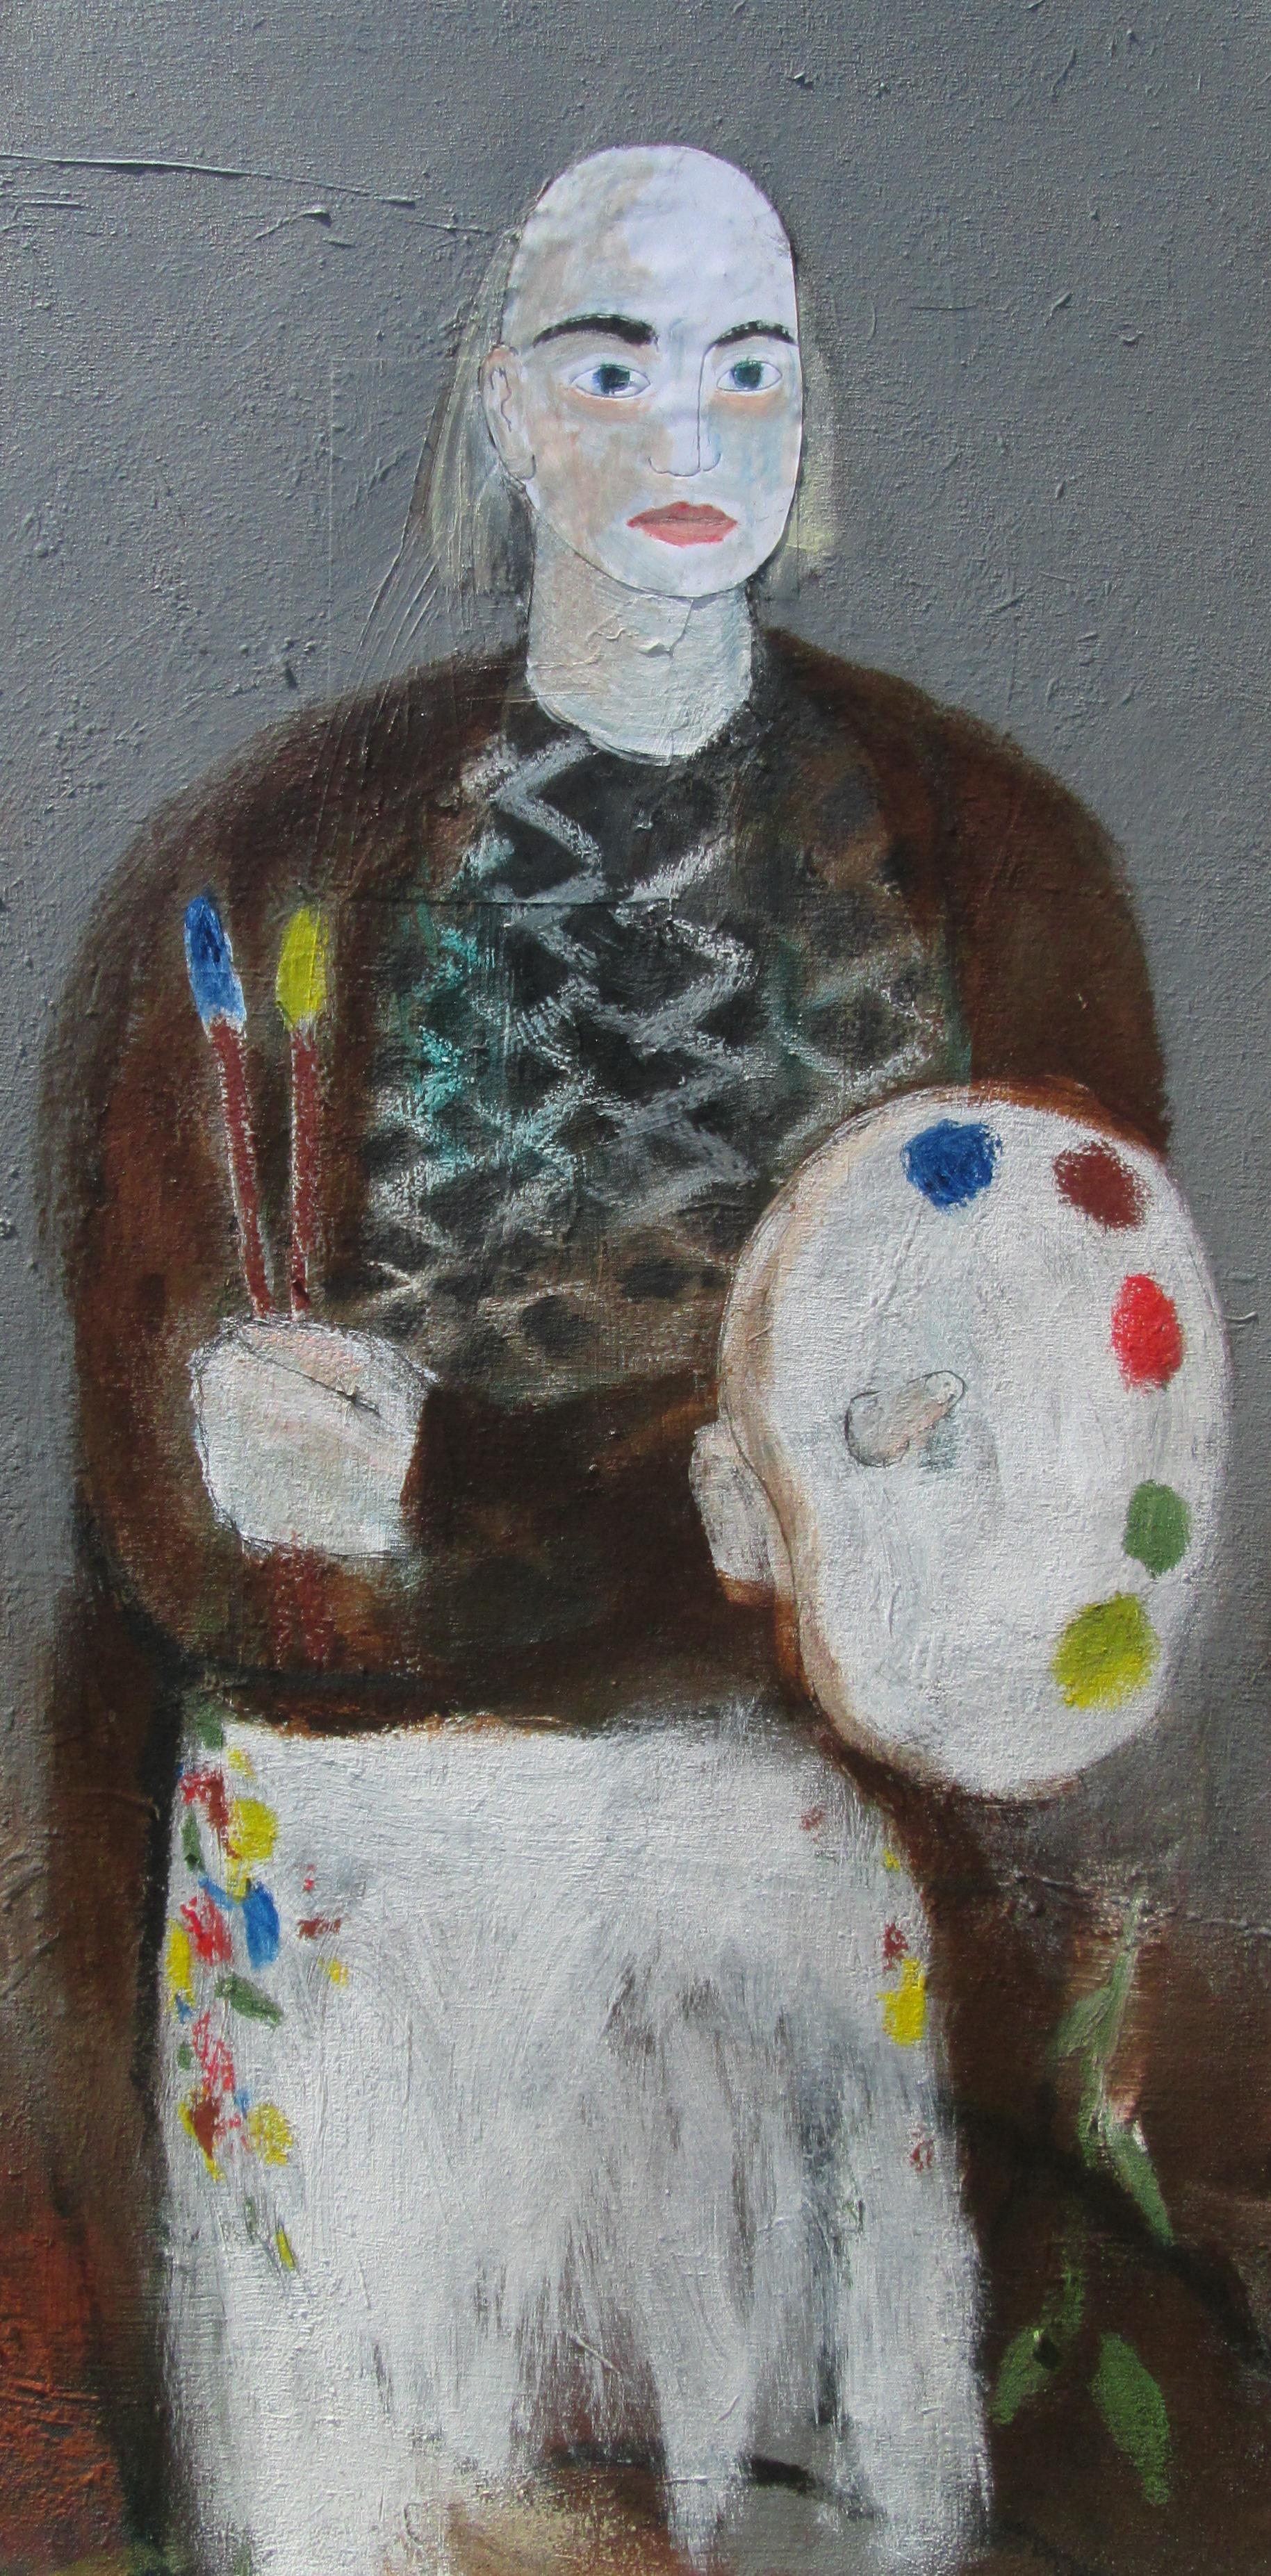 Self Portrait as Artist artwork by Joe McGee - art listed for sale on Artplode